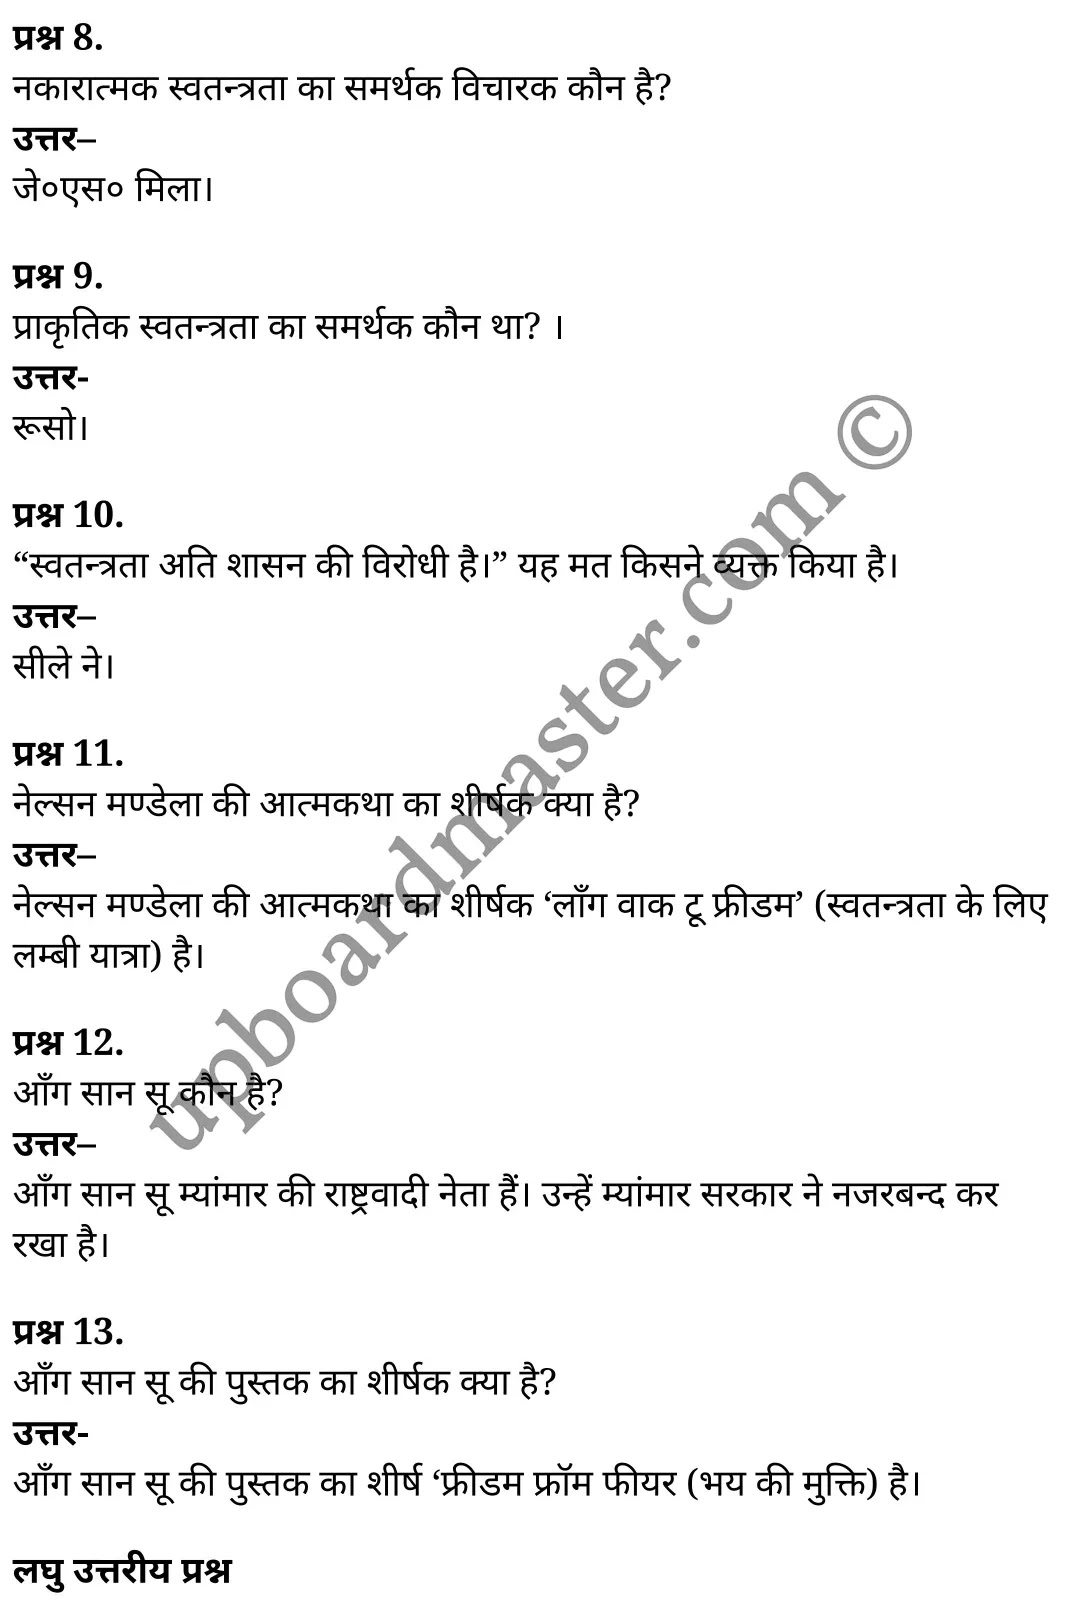 कक्षा 11 नागरिकशास्त्र  राजनीतिक सिद्धांत अध्याय 2  के नोट्स  हिंदी में एनसीईआरटी समाधान,     class 11 civics chapter 2,   class 11 civics chapter 2 ncert solutions in civics,  class 11 civics chapter 2 notes in hindi,   class 11 civics chapter 2 question answer,   class 11 civics chapter 2 notes,   class 11 civics chapter 2 class 11 civics  chapter 2 in  hindi,    class 11 civics chapter 2 important questions in  hindi,   class 11 civics hindi  chapter 2 notes in hindi,   class 11 civics  chapter 2 test,   class 11 civics  chapter 2 class 11 civics  chapter 2 pdf,   class 11 civics  chapter 2 notes pdf,   class 11 civics  chapter 2 exercise solutions,  class 11 civics  chapter 2,  class 11 civics  chapter 2 notes study rankers,  class 11 civics  chapter 2 notes,   class 11 civics hindi  chapter 2 notes,    class 11 civics   chapter 2  class 11  notes pdf,  class 11 civics  chapter 2 class 11  notes  ncert,  class 11 civics  chapter 2 class 11 pdf,   class 11 civics  chapter 2  book,   class 11 civics  chapter 2 quiz class 11  ,    11  th class 11 civics chapter 2  book up board,   up board 11  th class 11 civics chapter 2 notes,  class 11 civics  Political theory chapter 2,   class 11 civics  Political theory chapter 2 ncert solutions in civics,   class 11 civics  Political theory chapter 2 notes in hindi,   class 11 civics  Political theory chapter 2 question answer,   class 11 civics  Political theory  chapter 2 notes,  class 11 civics  Political theory  chapter 2 class 11 civics  chapter 2 in  hindi,    class 11 civics  Political theory chapter 2 important questions in  hindi,   class 11 civics  Political theory  chapter 2 notes in hindi,    class 11 civics  Political theory  chapter 2 test,  class 11 civics  Political theory  chapter 2 class 11 civics  chapter 2 pdf,   class 11 civics  Political theory chapter 2 notes pdf,   class 11 civics  Political theory  chapter 2 exercise solutions,   class 11 civics  Political theory  chapter 2,  class 11 civics  Politic